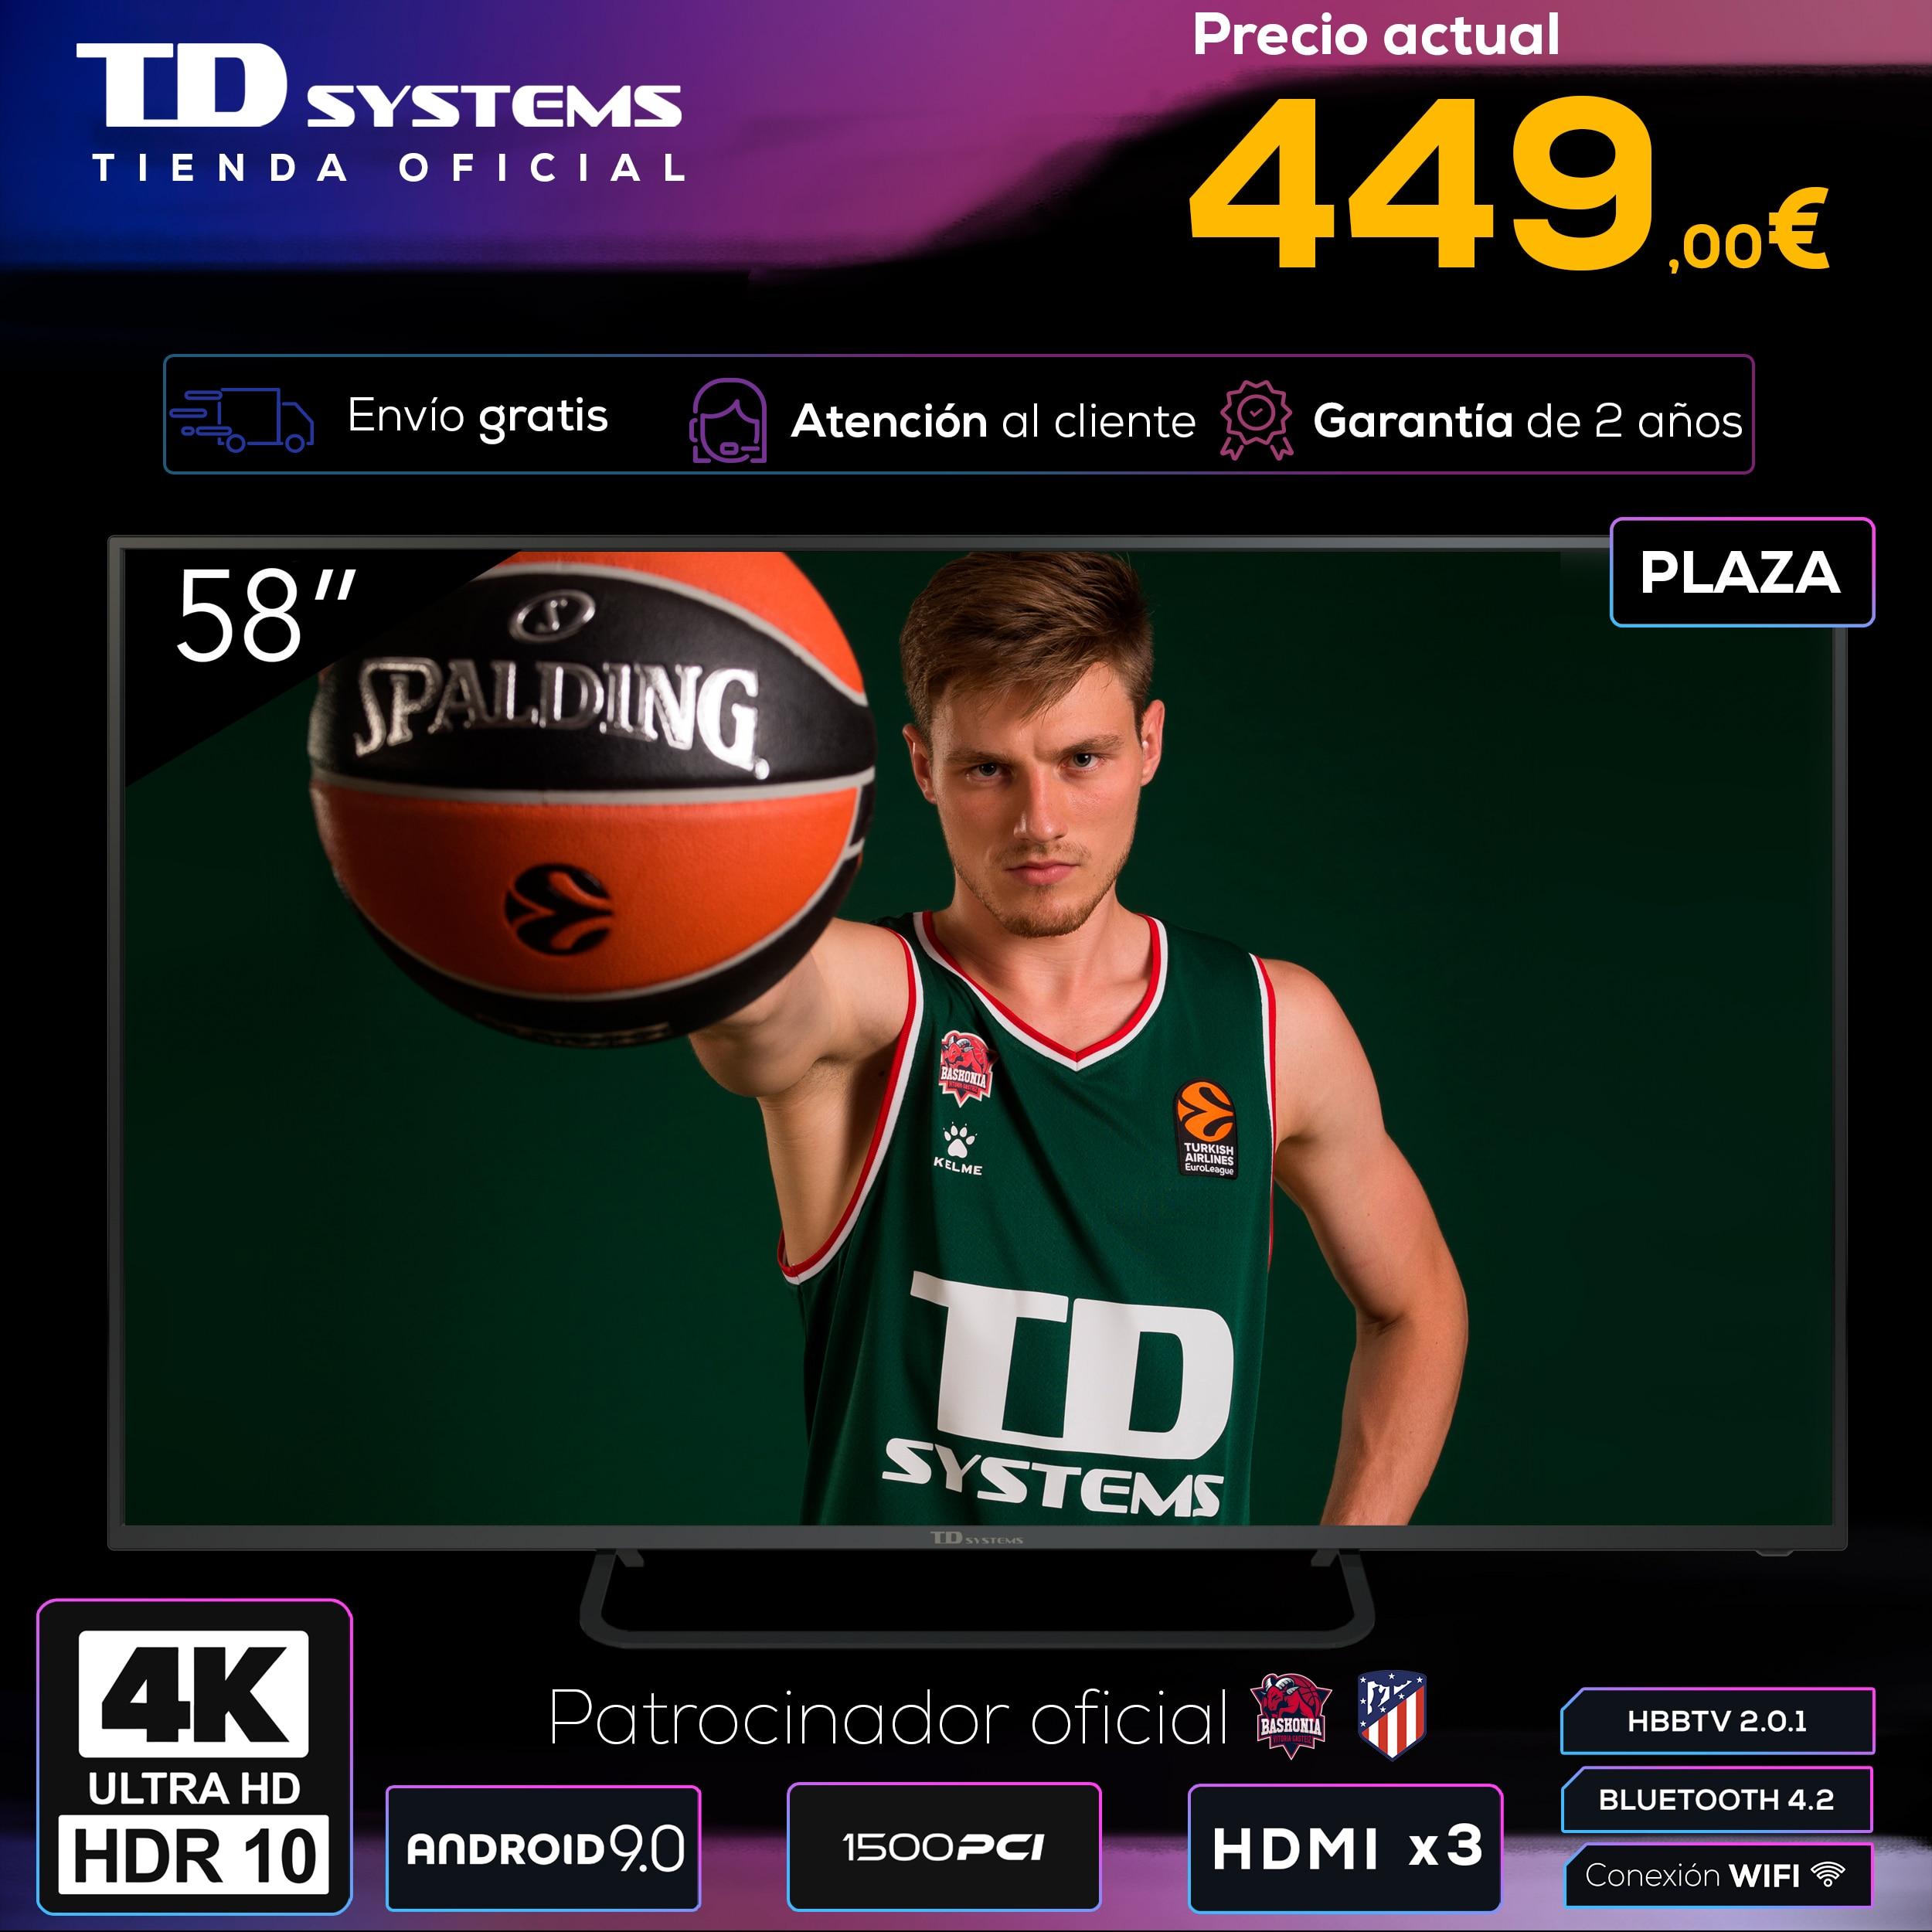 Televisores Smart TV 58 Pulgadas TD Systems K58DLX11US. UHD 4K HDR, DVB T2/C/S2, HbbTV [Envío desde España, garantía de 2 años]|Smart TV| - AliExpress